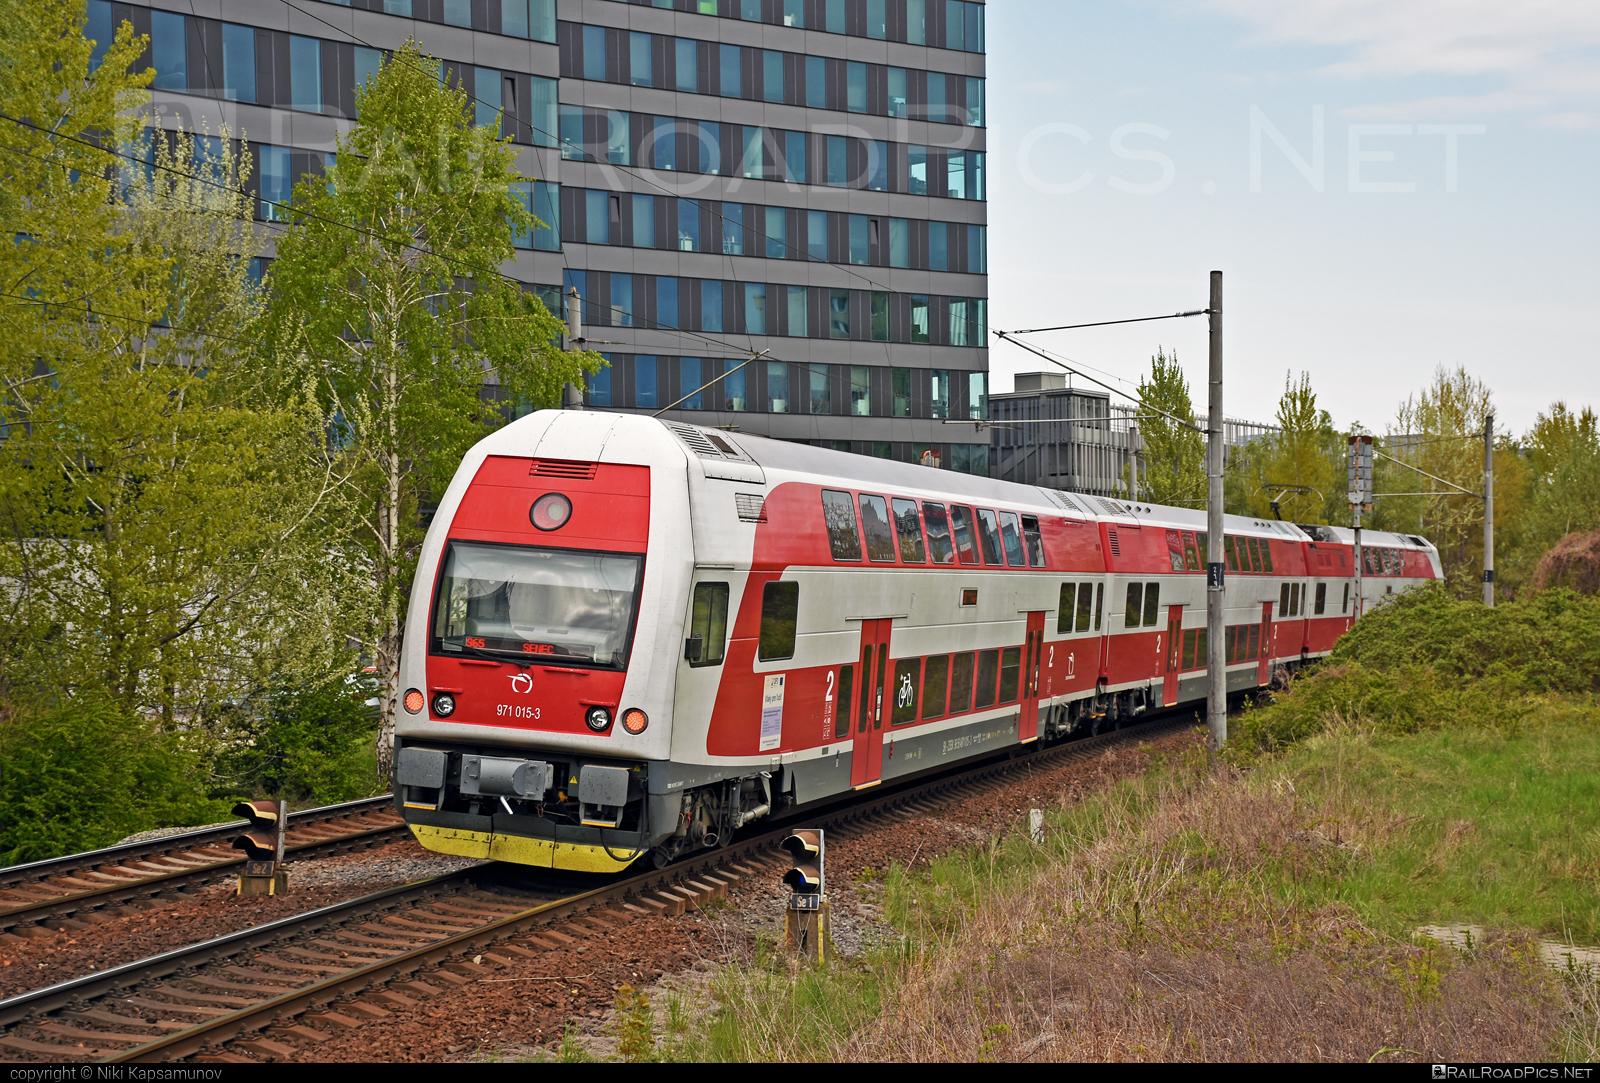 Škoda 4Ev - 971 015-3 operated by Železničná Spoločnost' Slovensko, a.s. #ZeleznicnaSpolocnostSlovensko #emu671 #skoda #skoda4ev #skodaclass671 #zssk